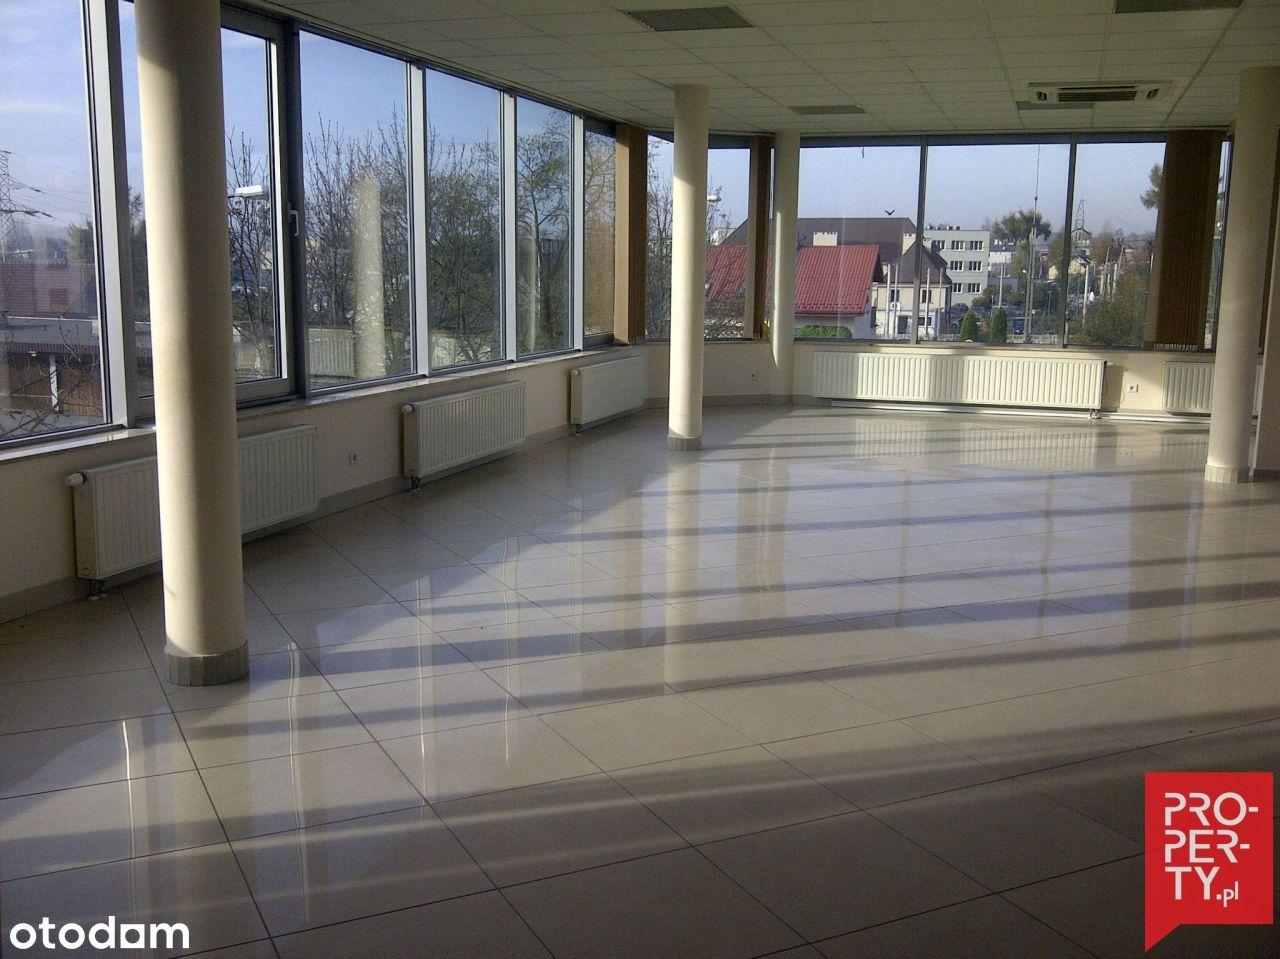 220 m2 Do Aranżacji Na Biuro, Handel, Usługi